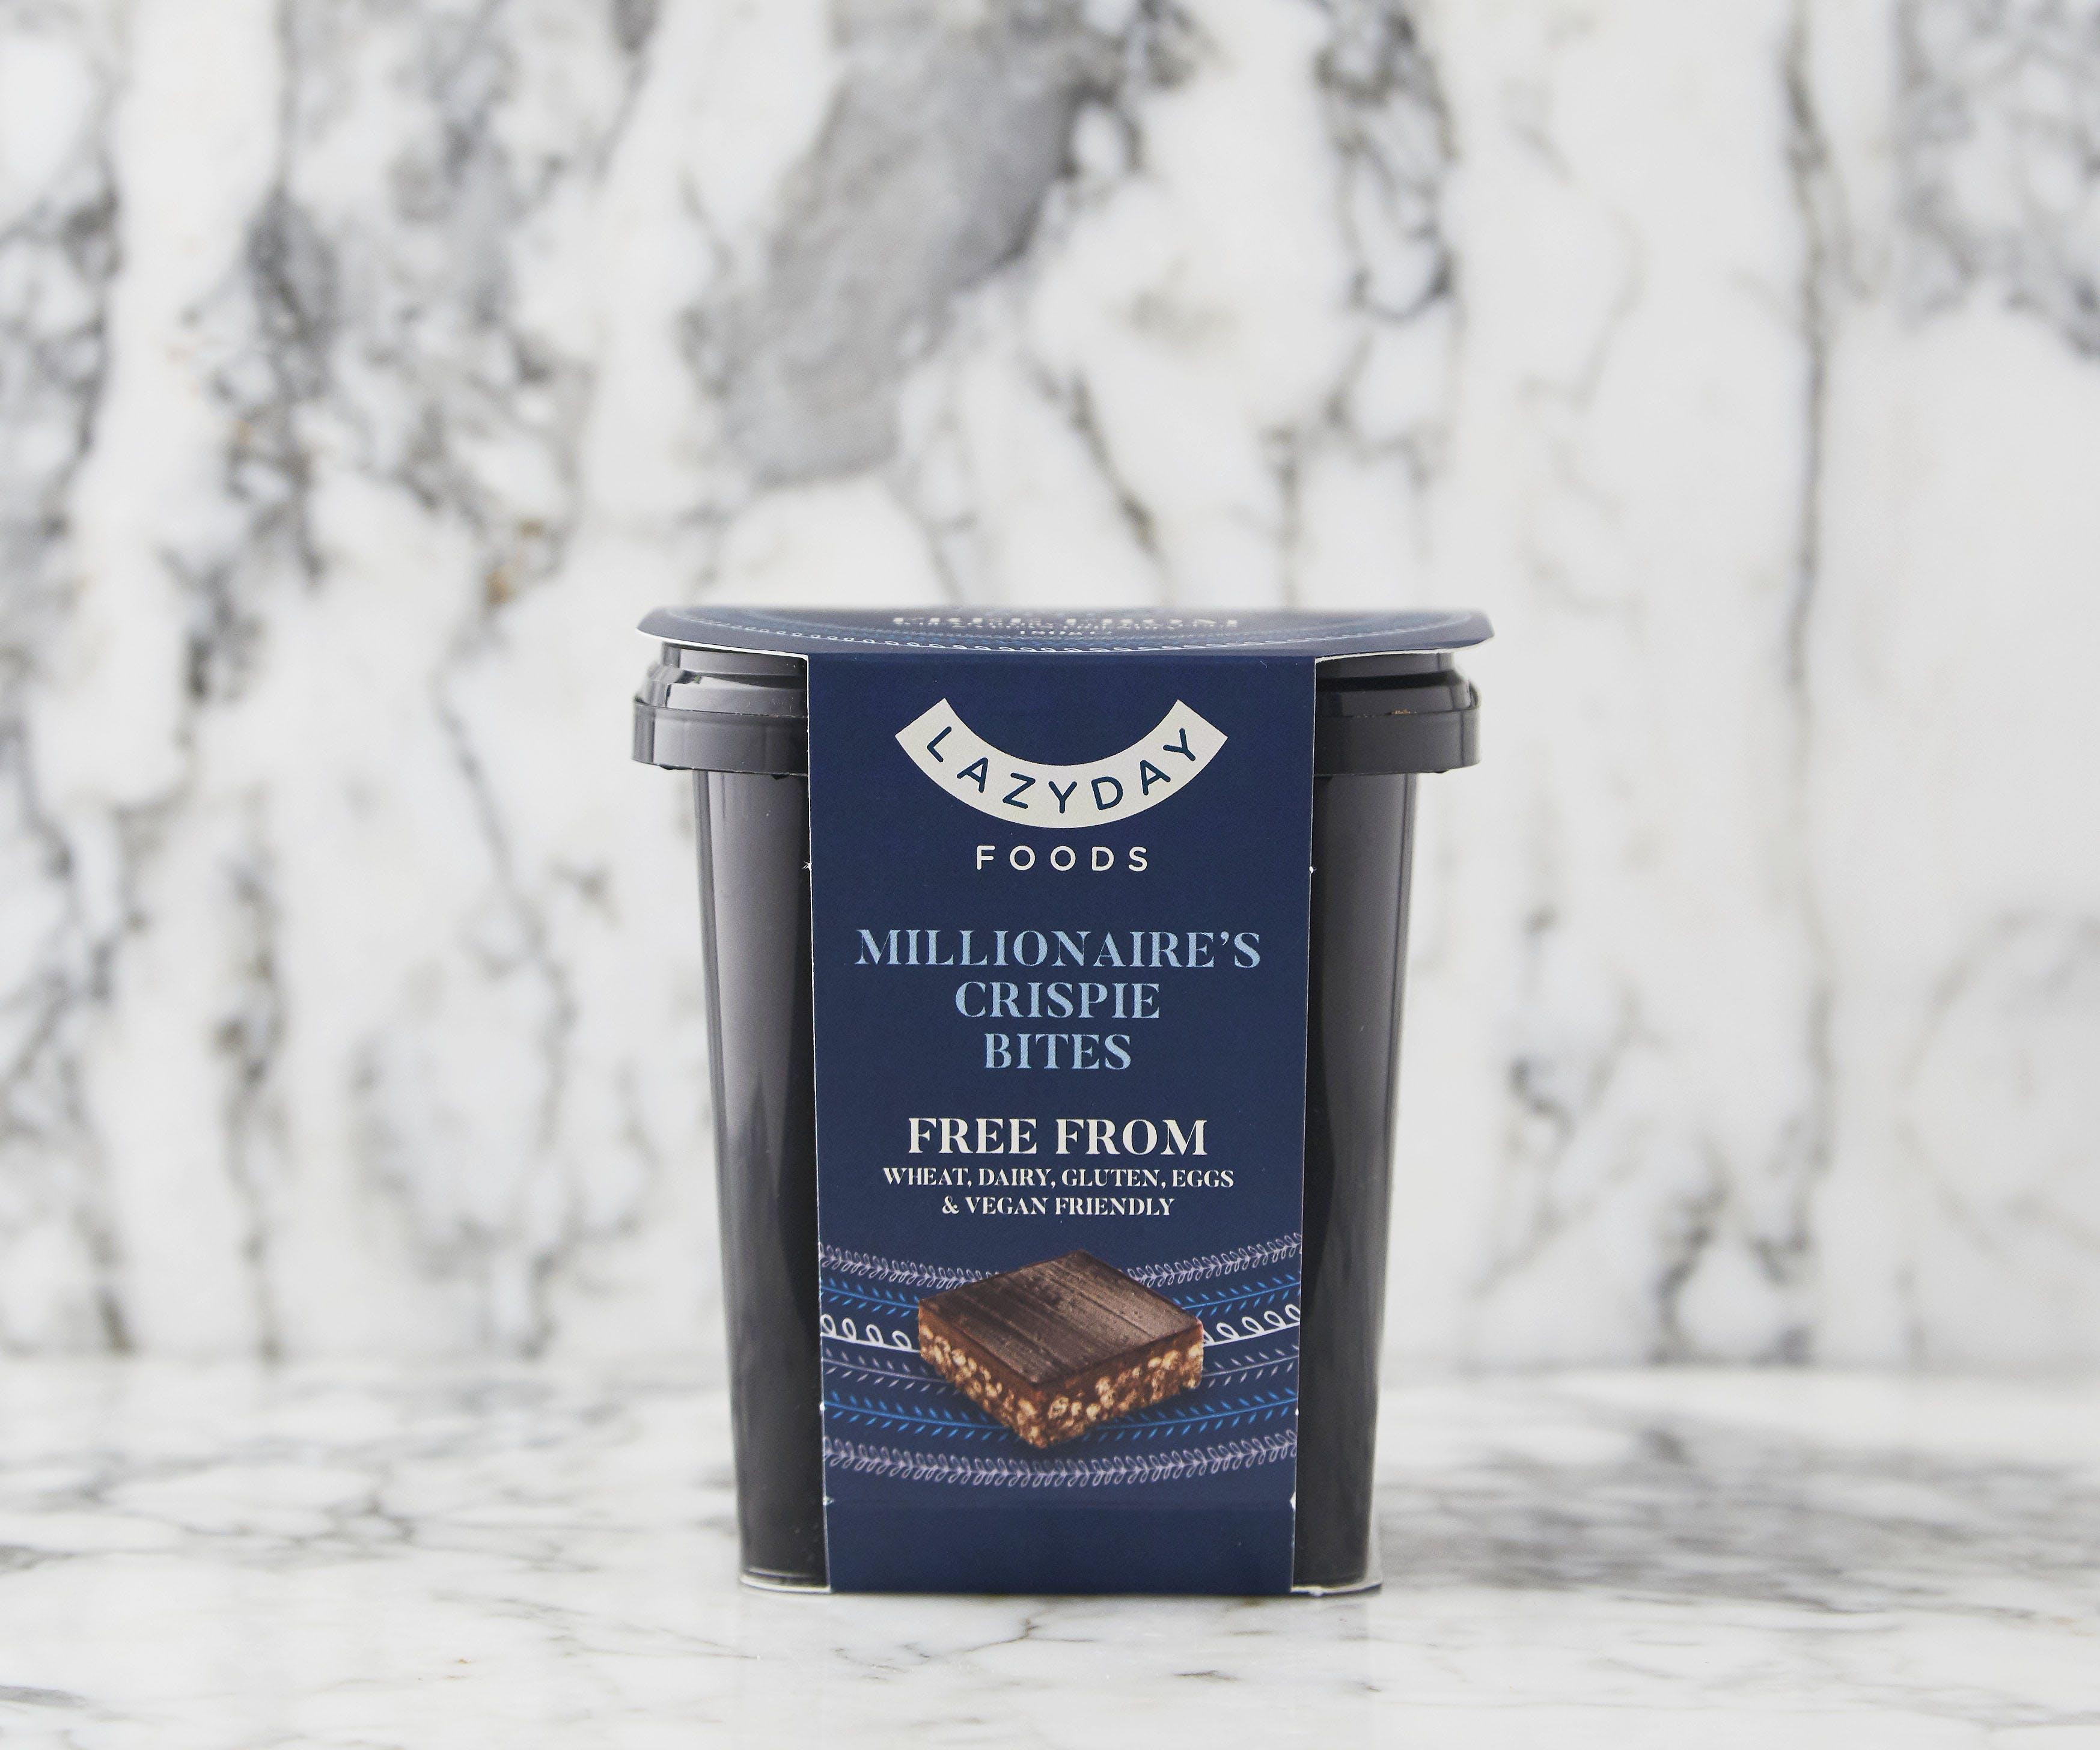 Millionaire's Crispy Bites